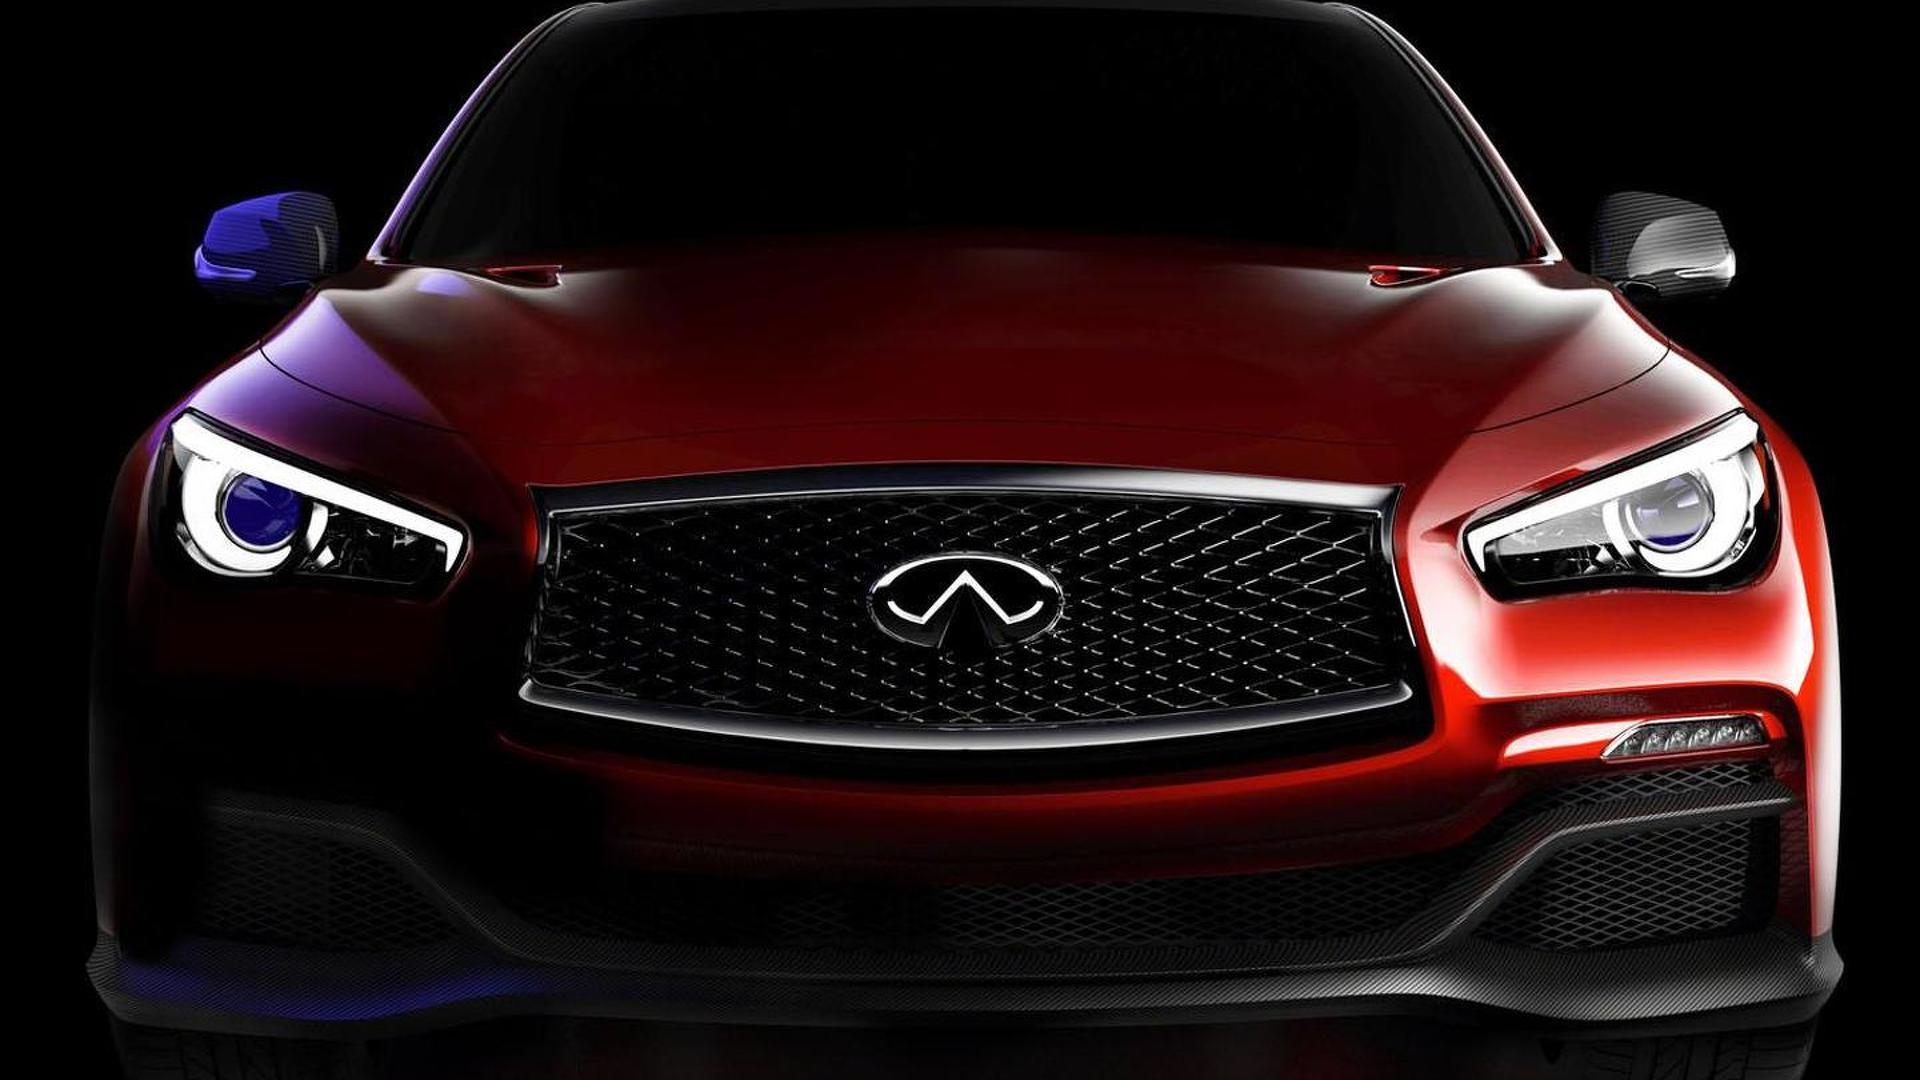 Infiniti Q50 Eau Rouge concept teased, debuts in Detroit [video]